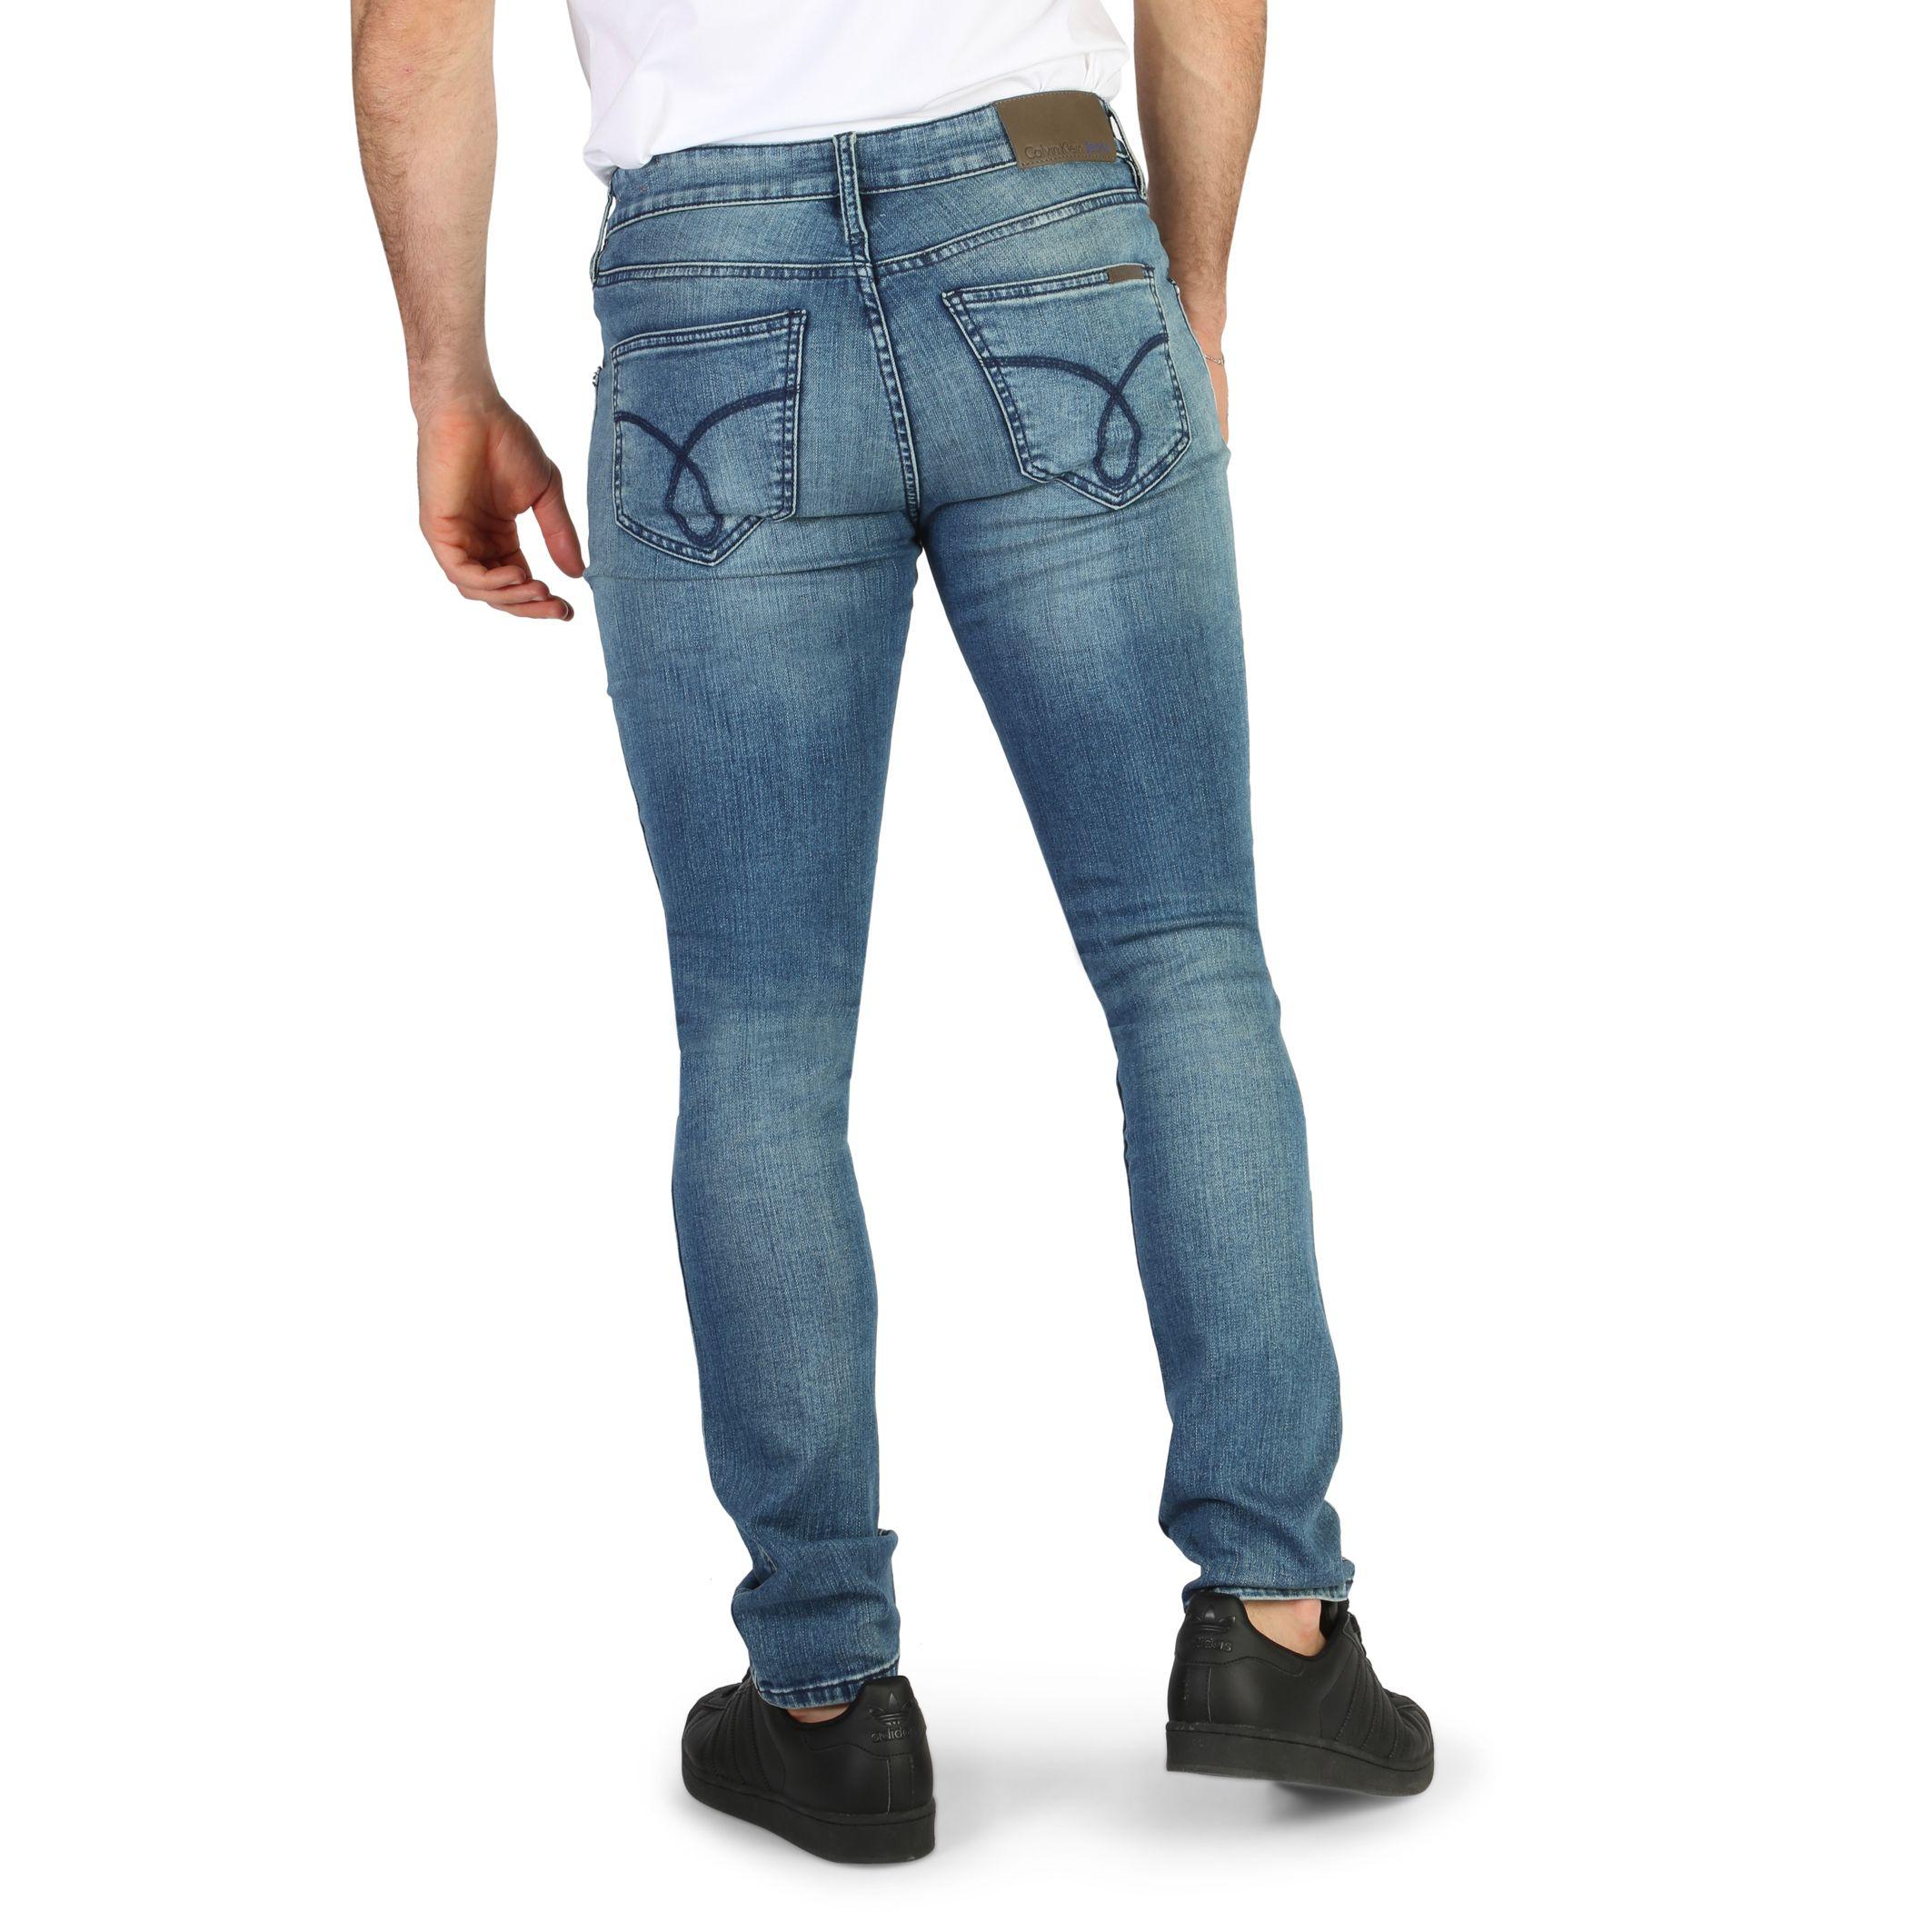 Calvin Klein – J30J301361 L32 Jeans Herr